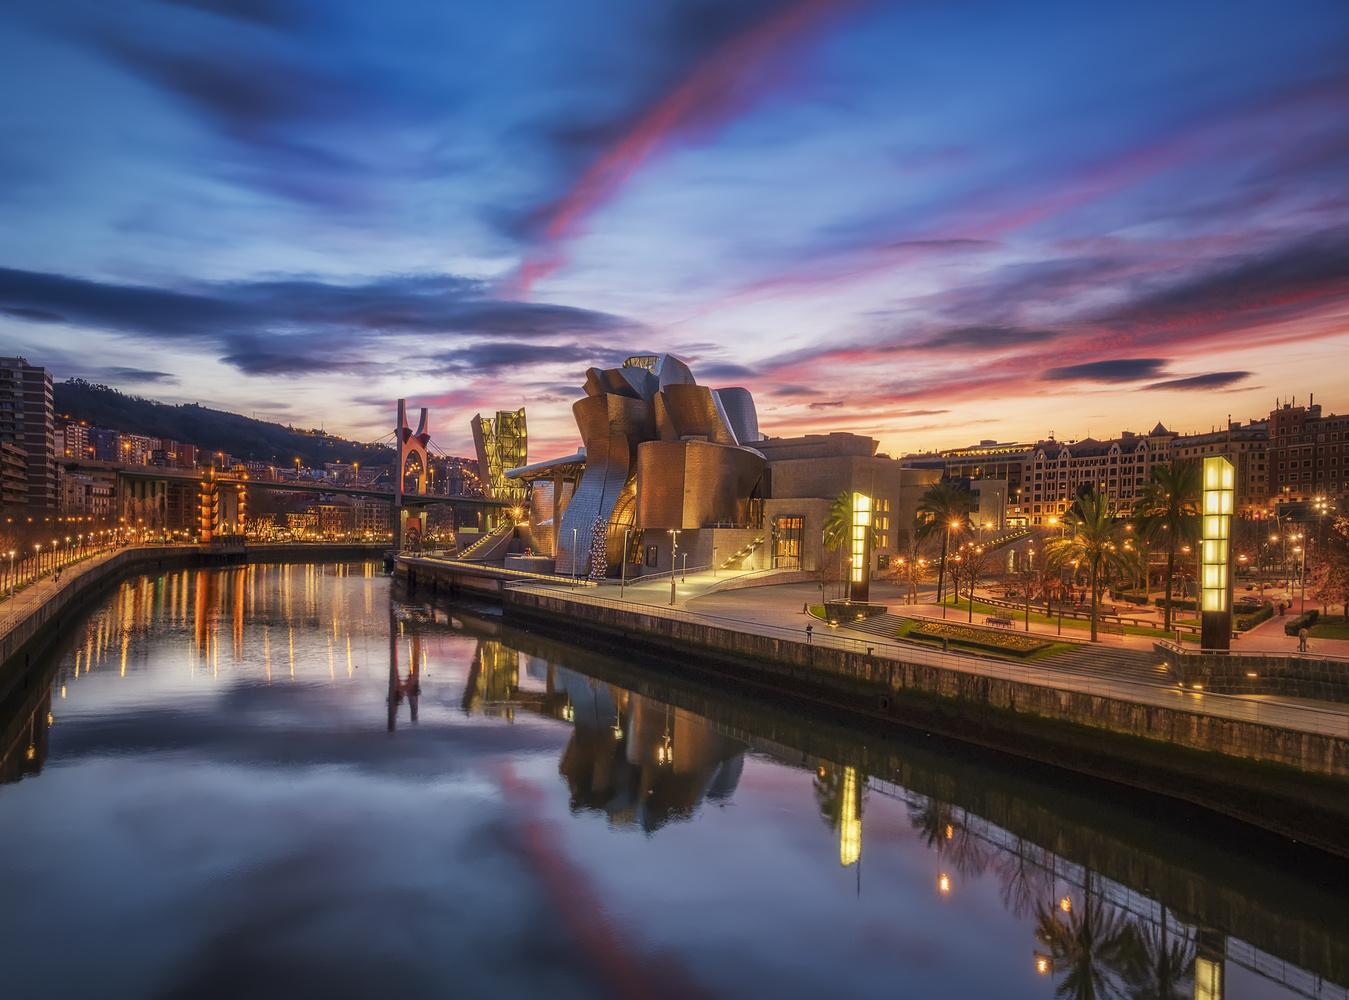 Just Bilbao by Aritz Atela